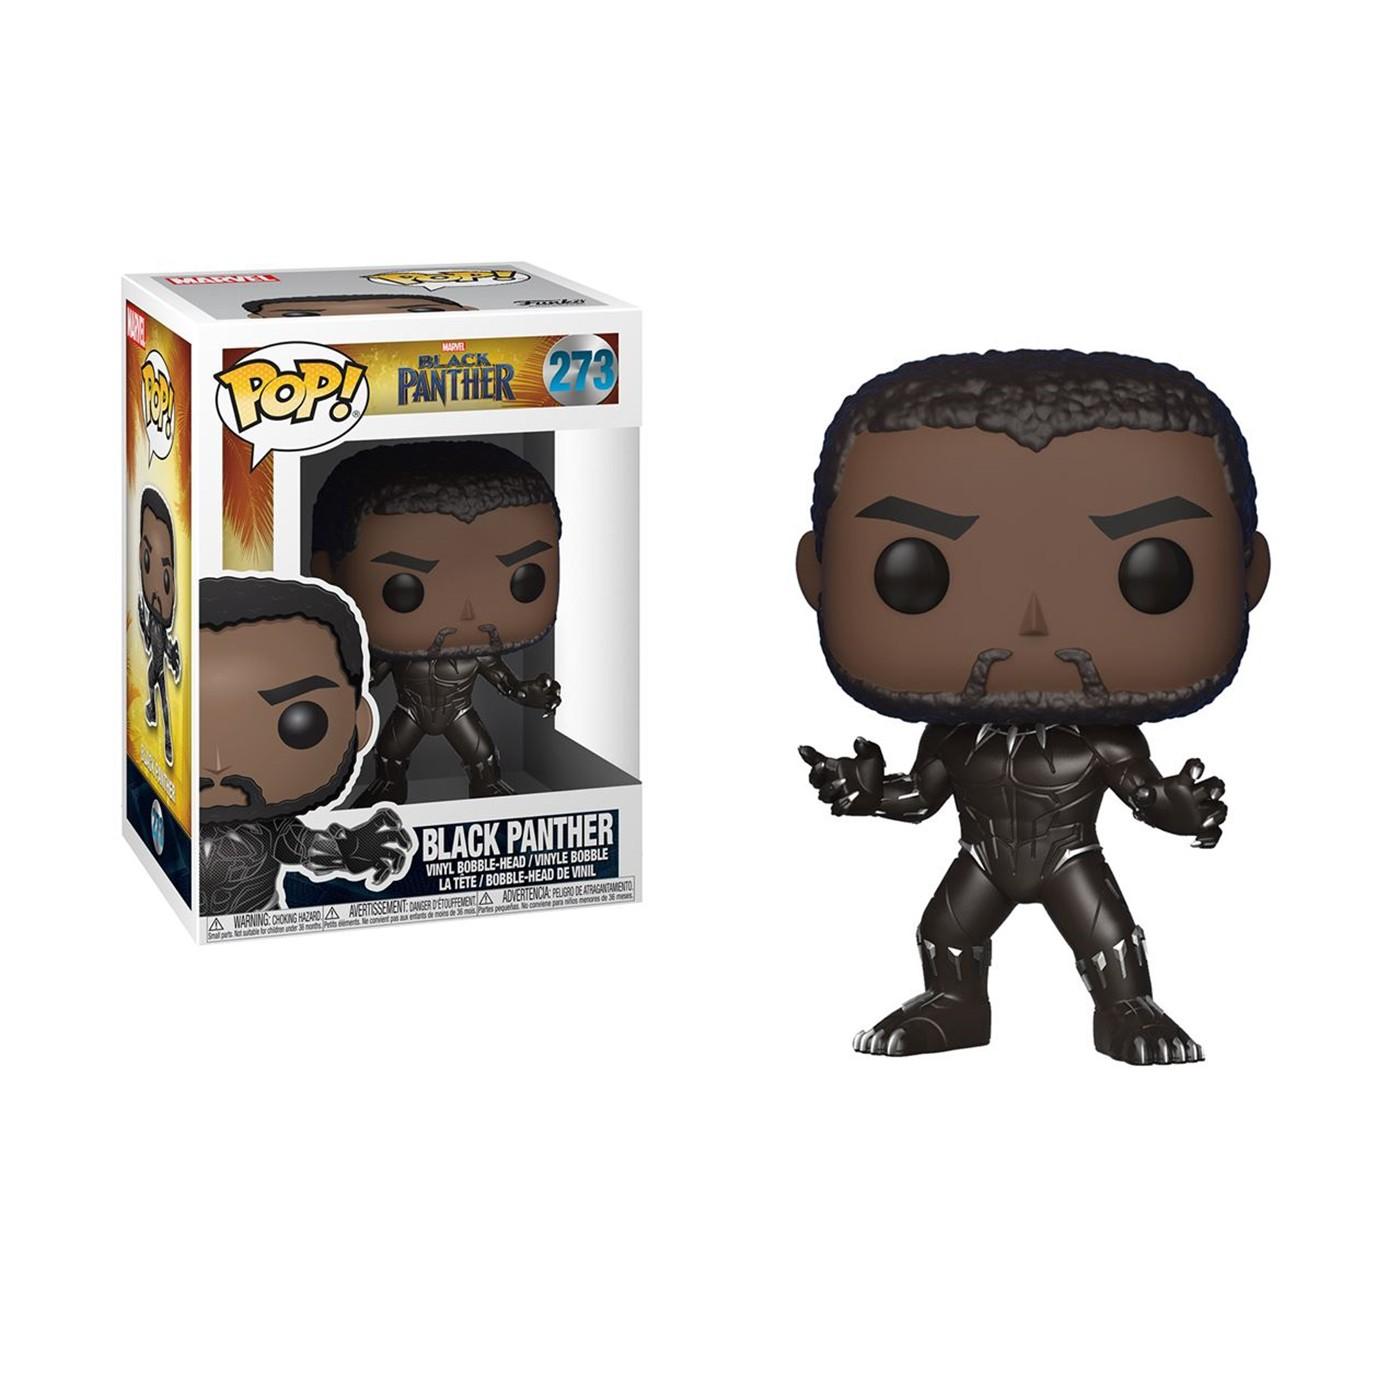 Black Panther Movie Funko Pop Bobble Head